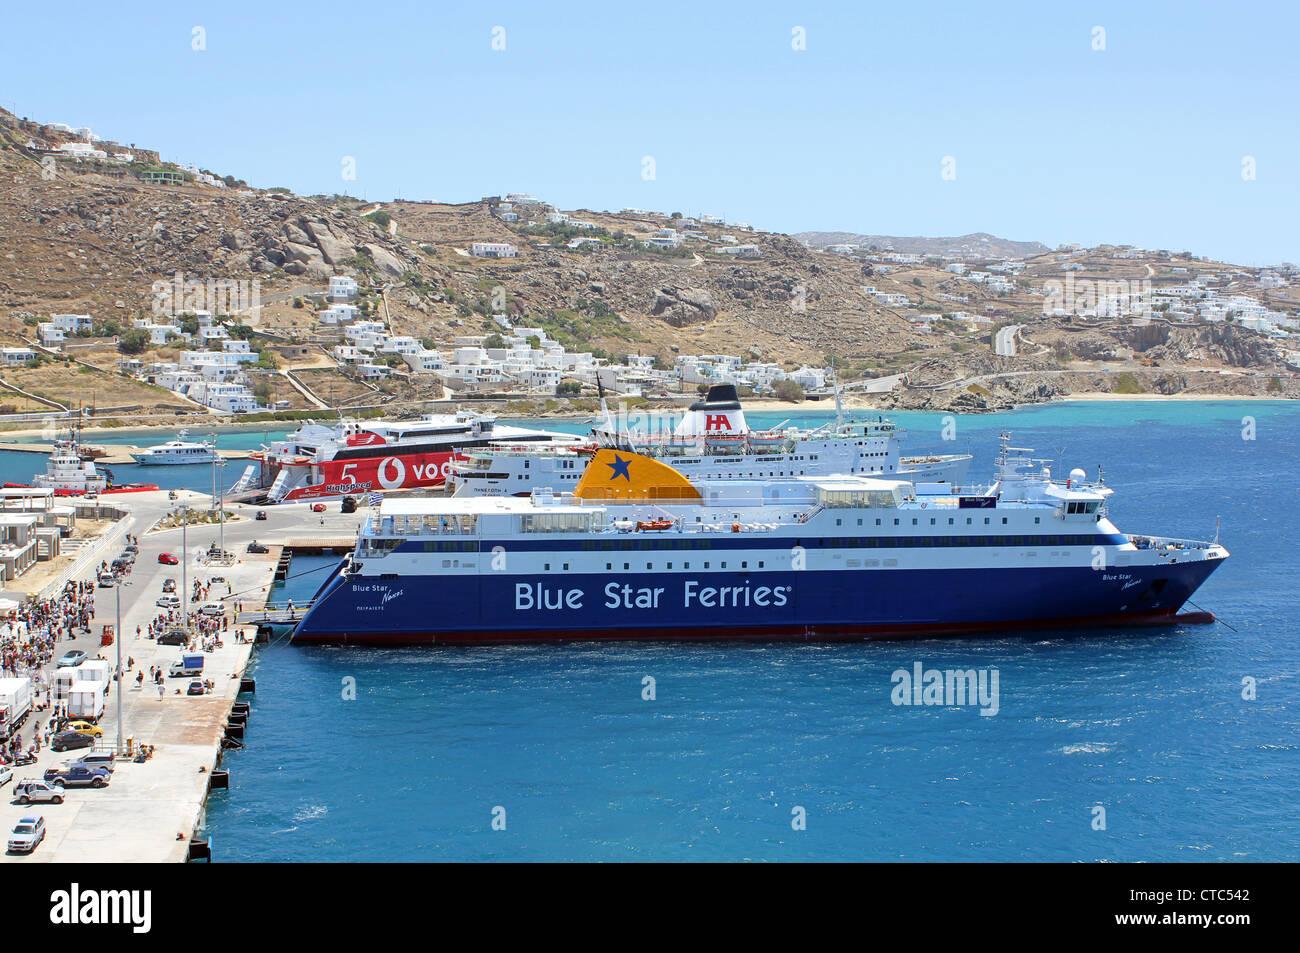 Blue Star Ferries - Stock Image